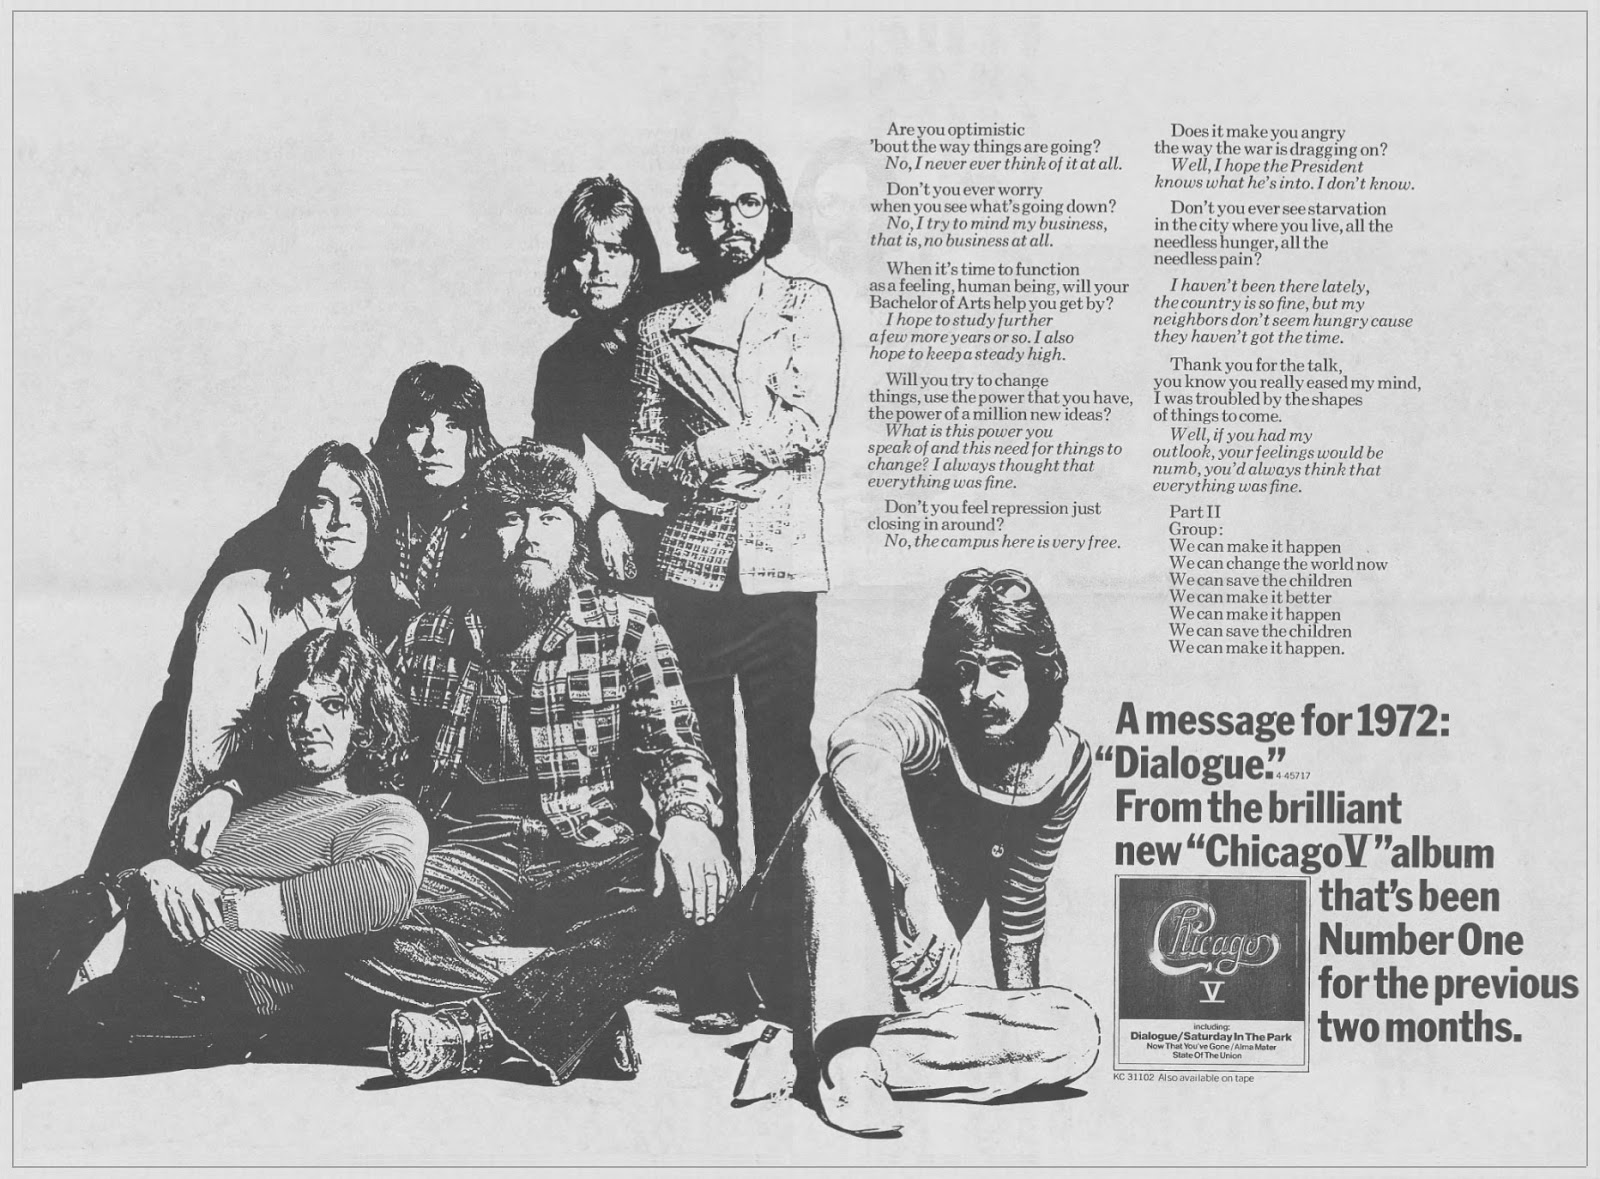 Chicago V Advertisement 1972